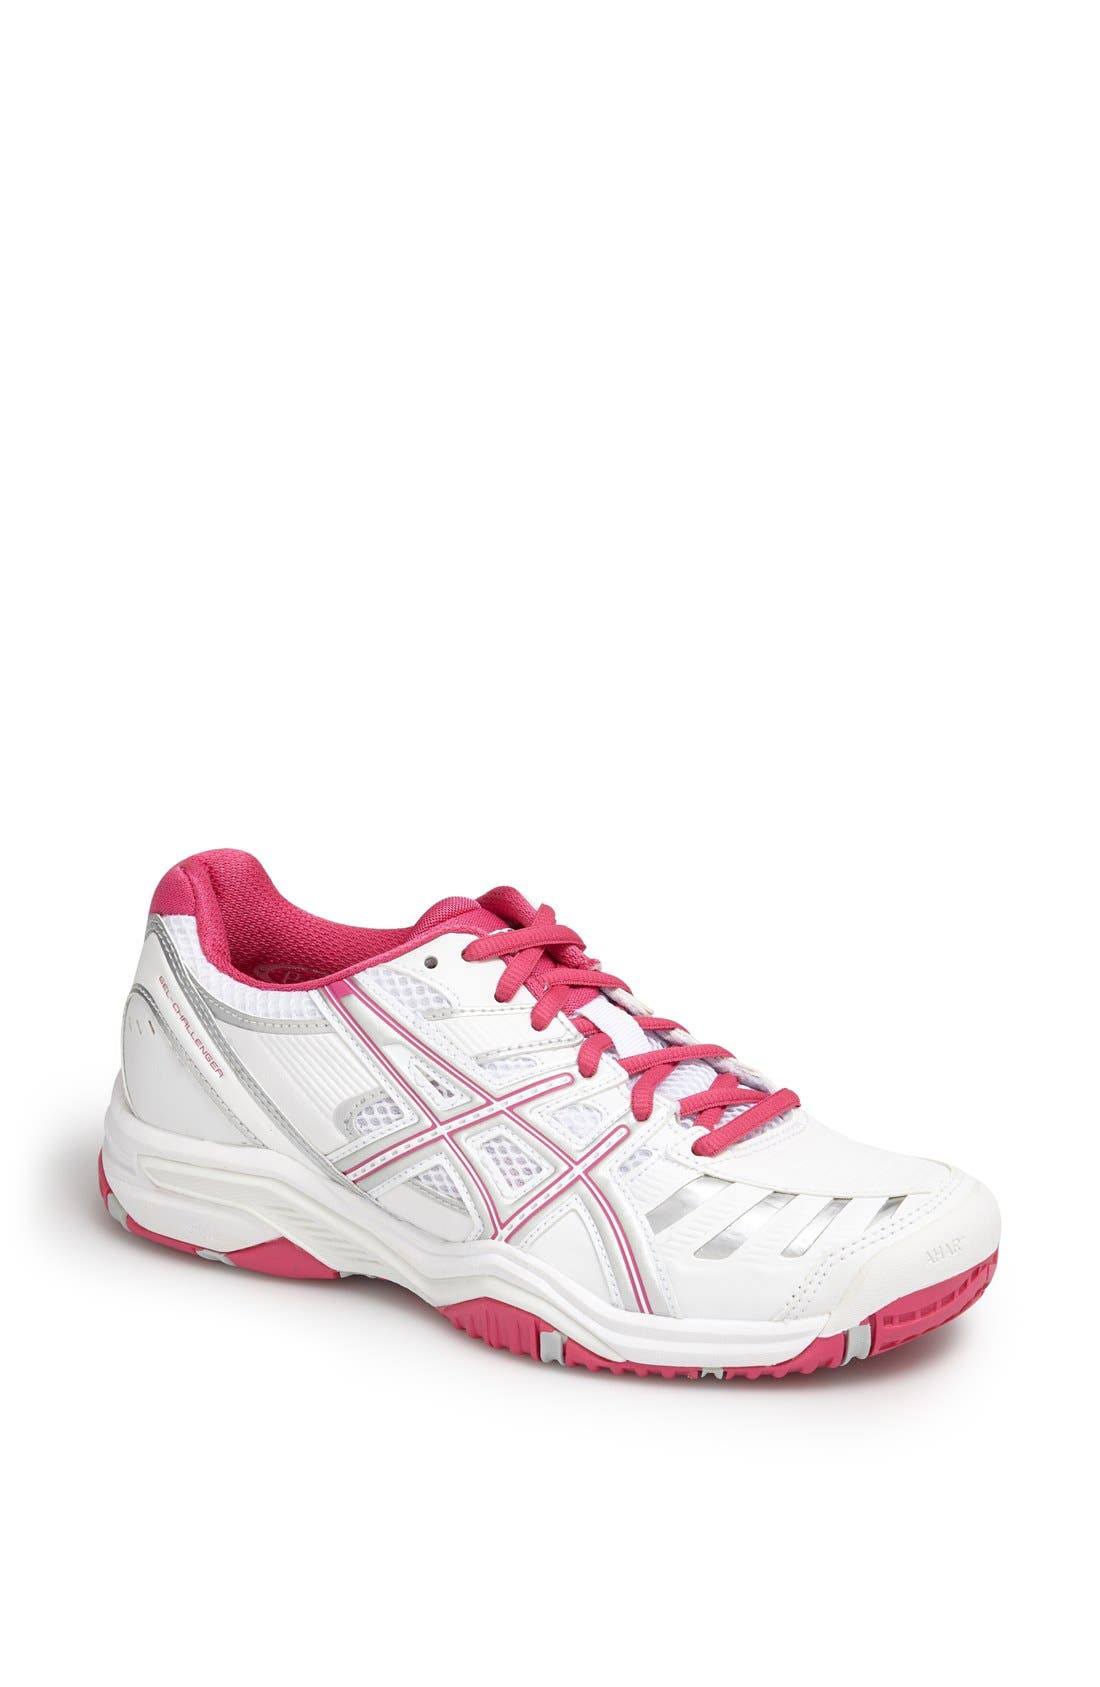 Alternate Image 1 Selected - ASICS® 'GEL-Challenger 9' Tennis Shoe (Women)